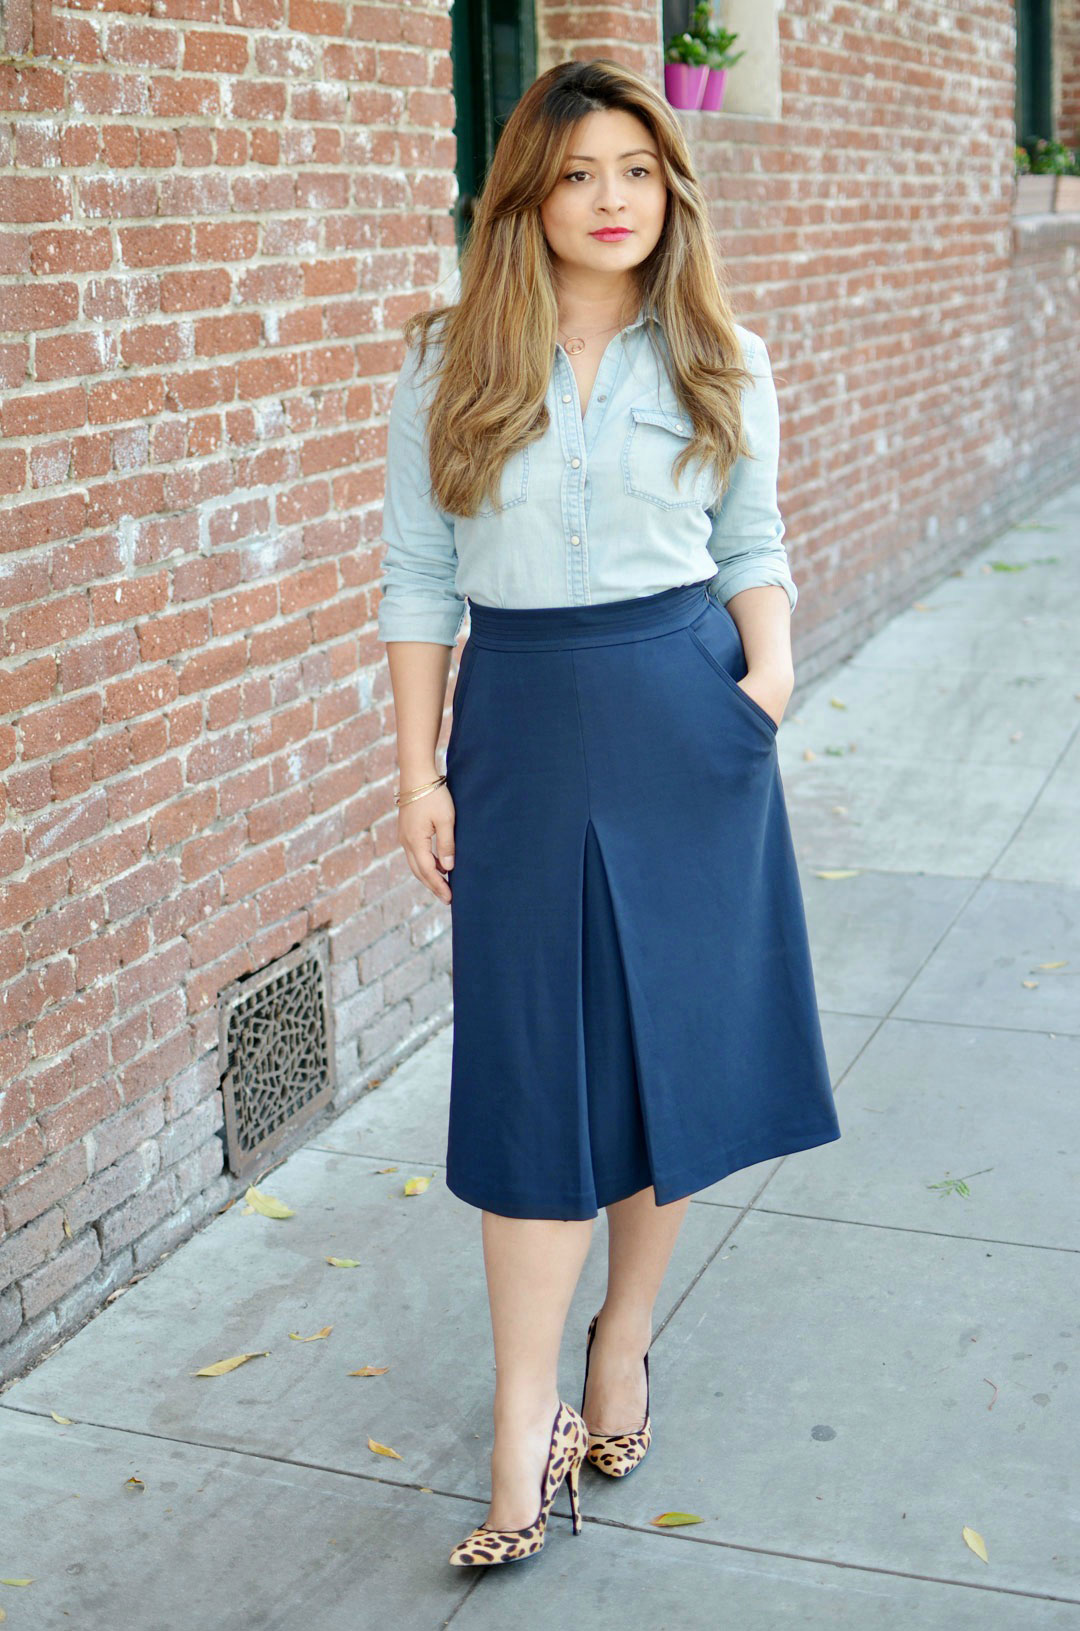 denim shirt with midi-skirt